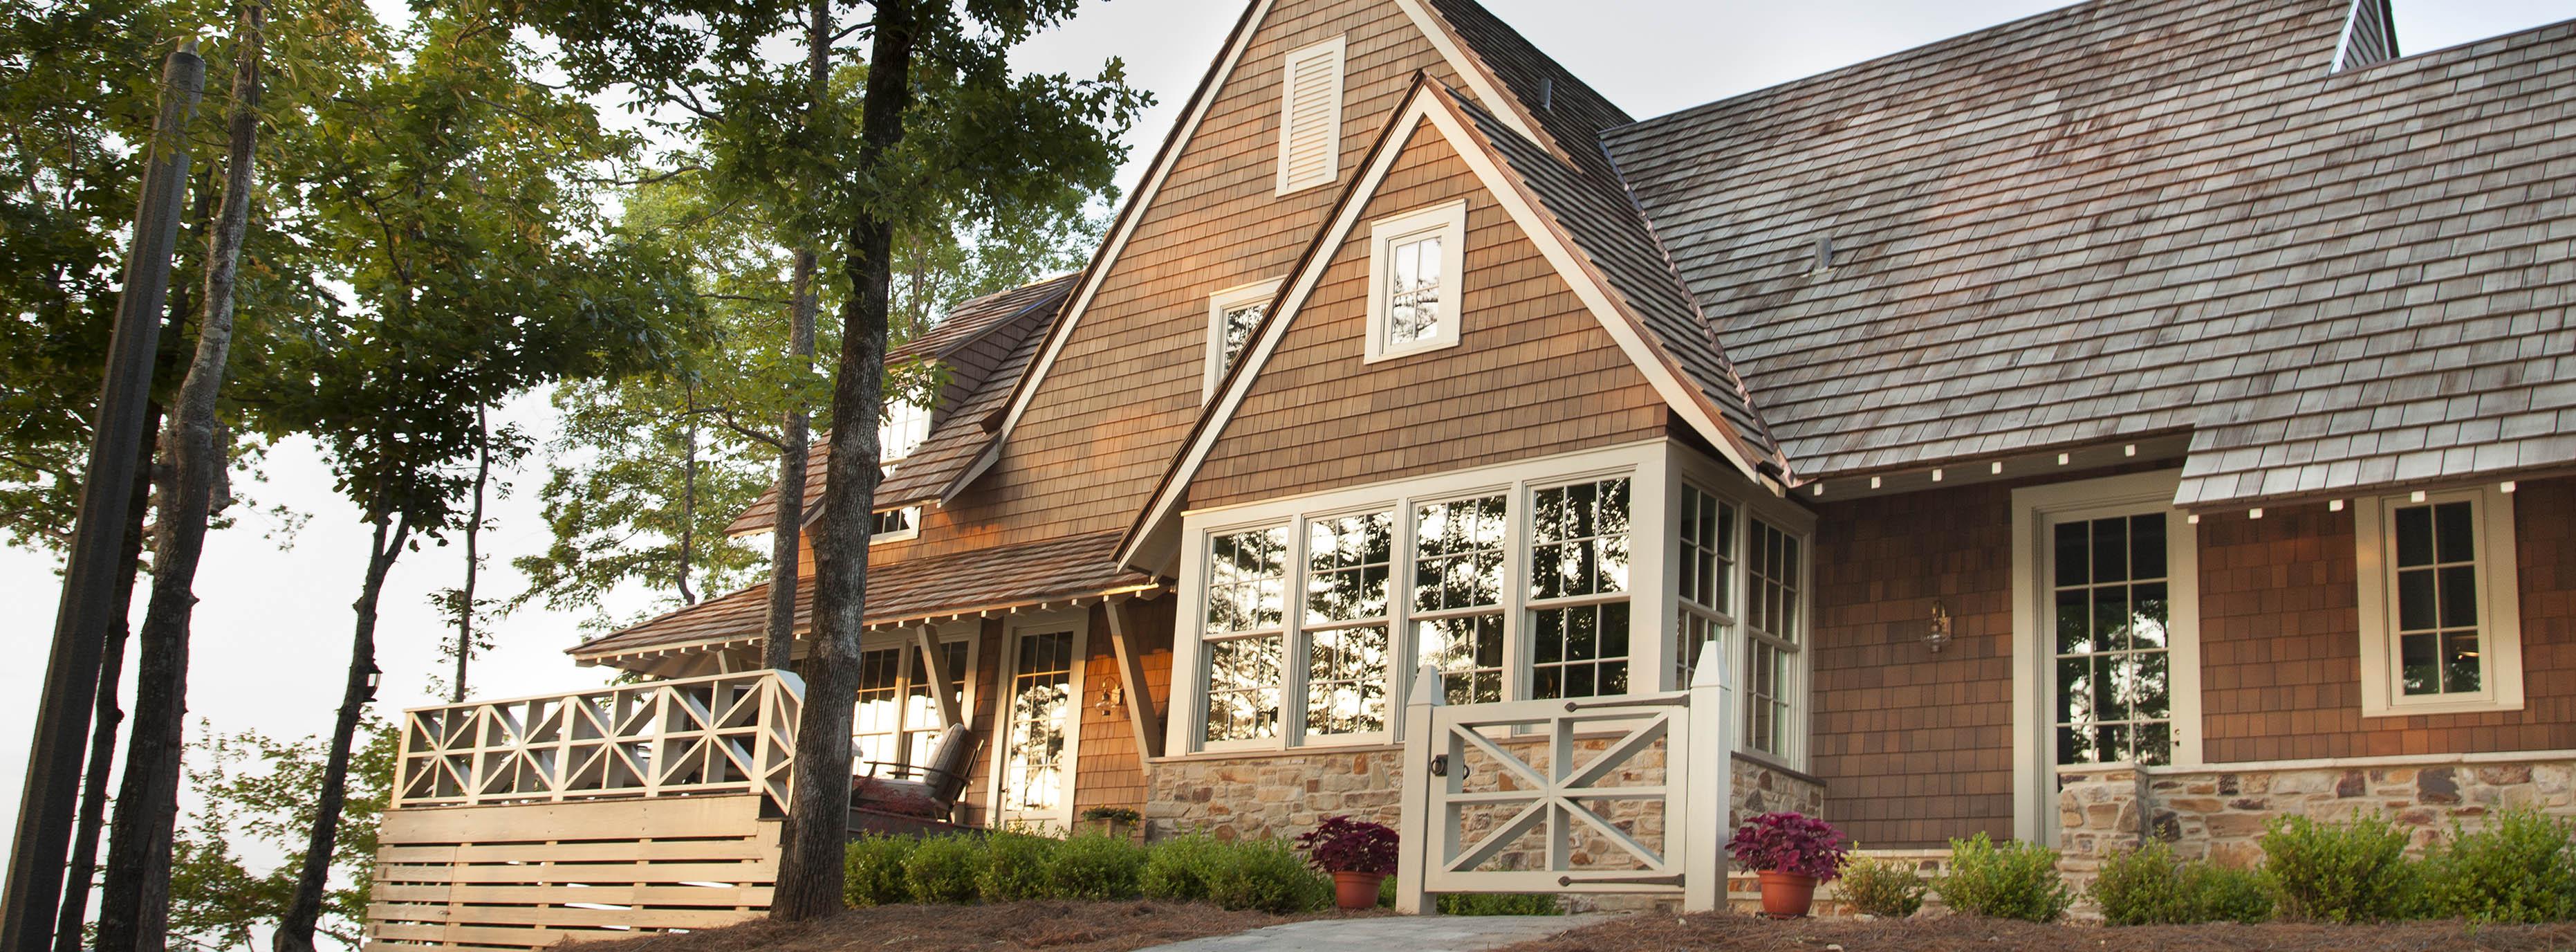 Shakertown Cedar Siding | Cedar Shake Siding, Shingles, Roofing